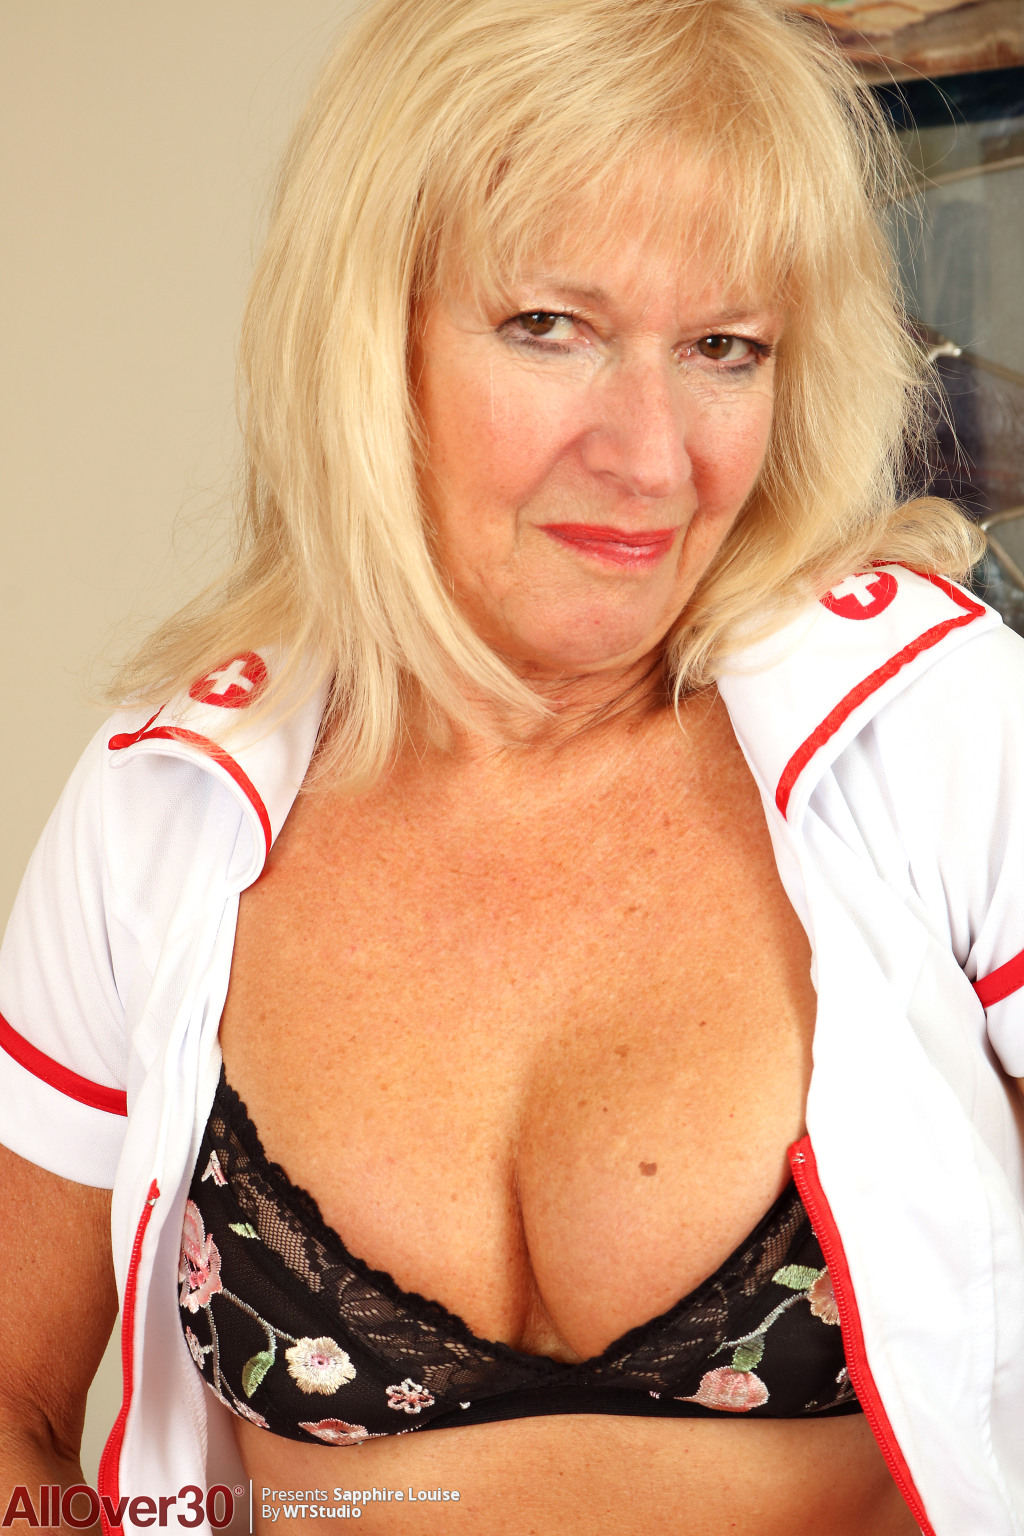 flirty-nurse-sapphire-louise-04